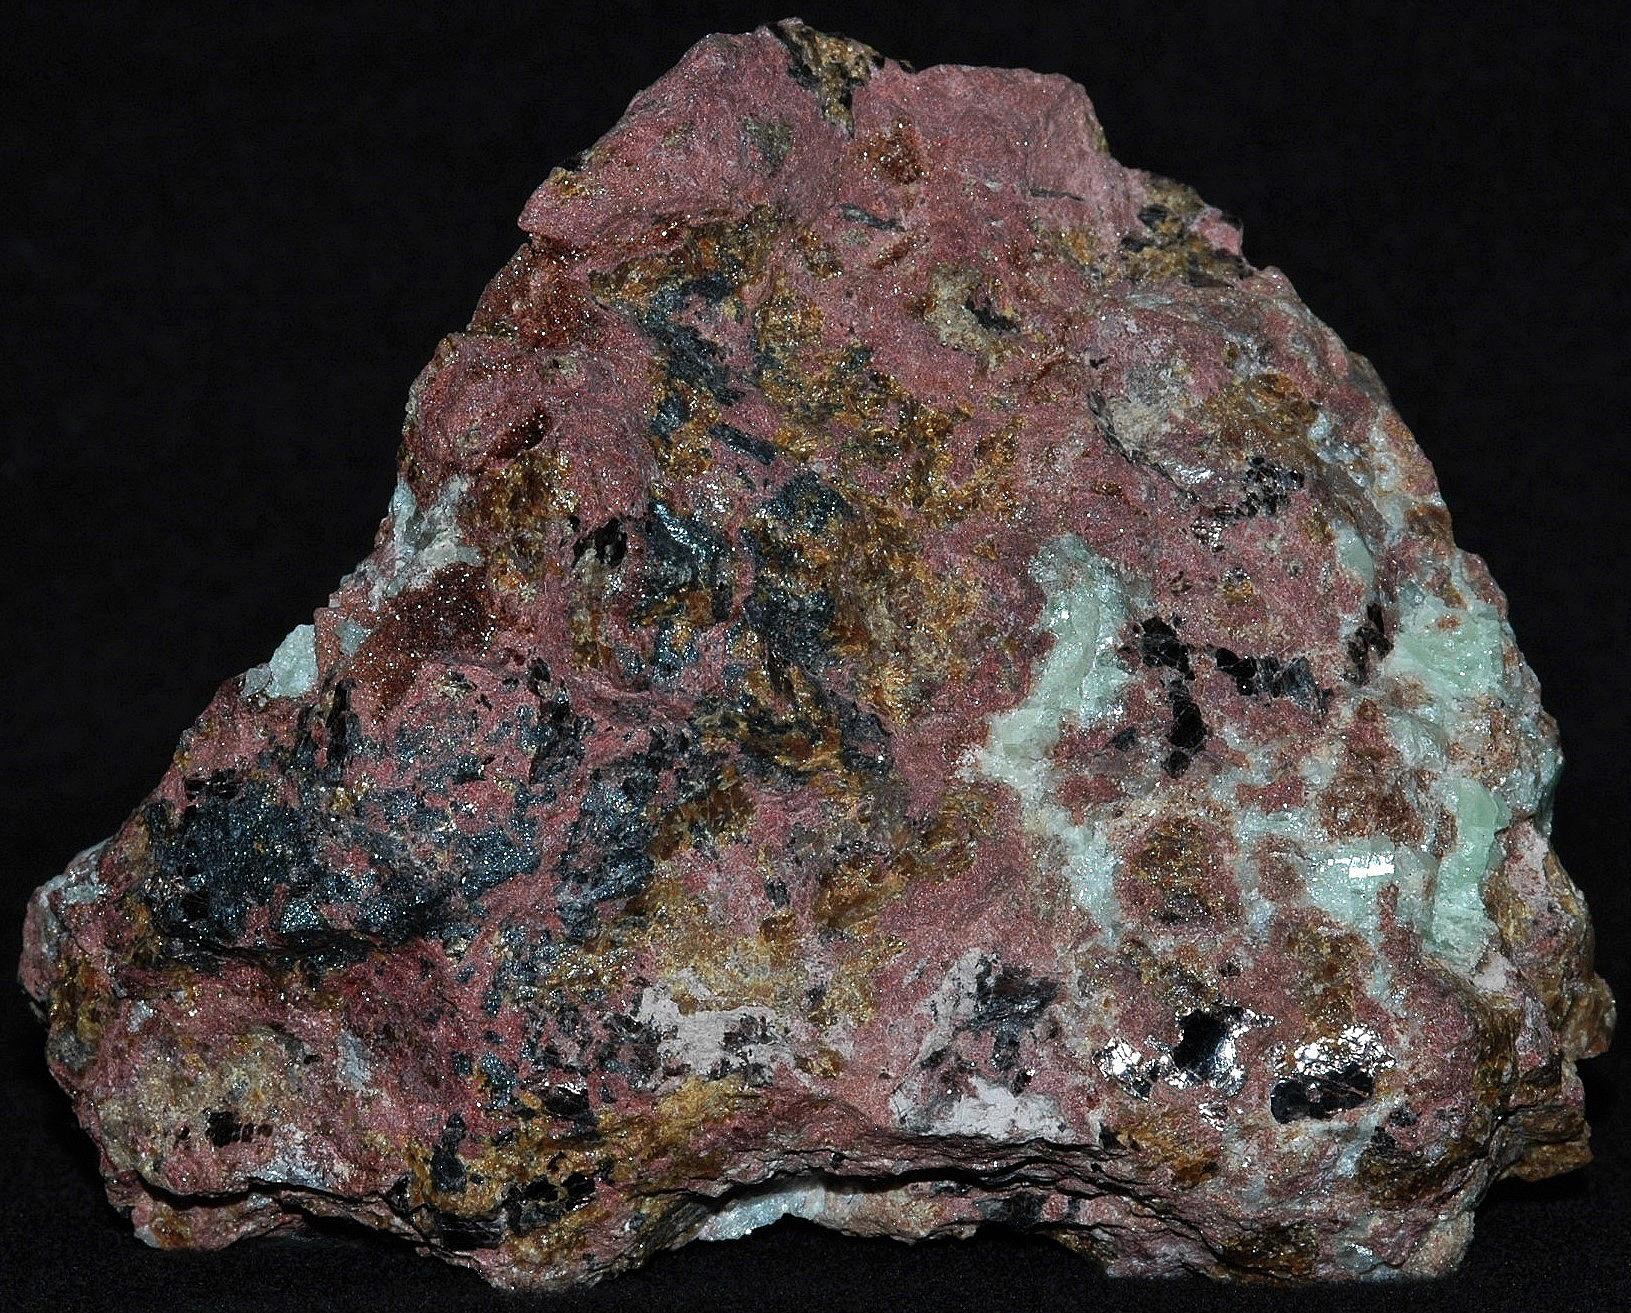 Hancockite (brick red), franklinite, andradite garnet, willemite and minor hendricksite mica from Franklin, NJ